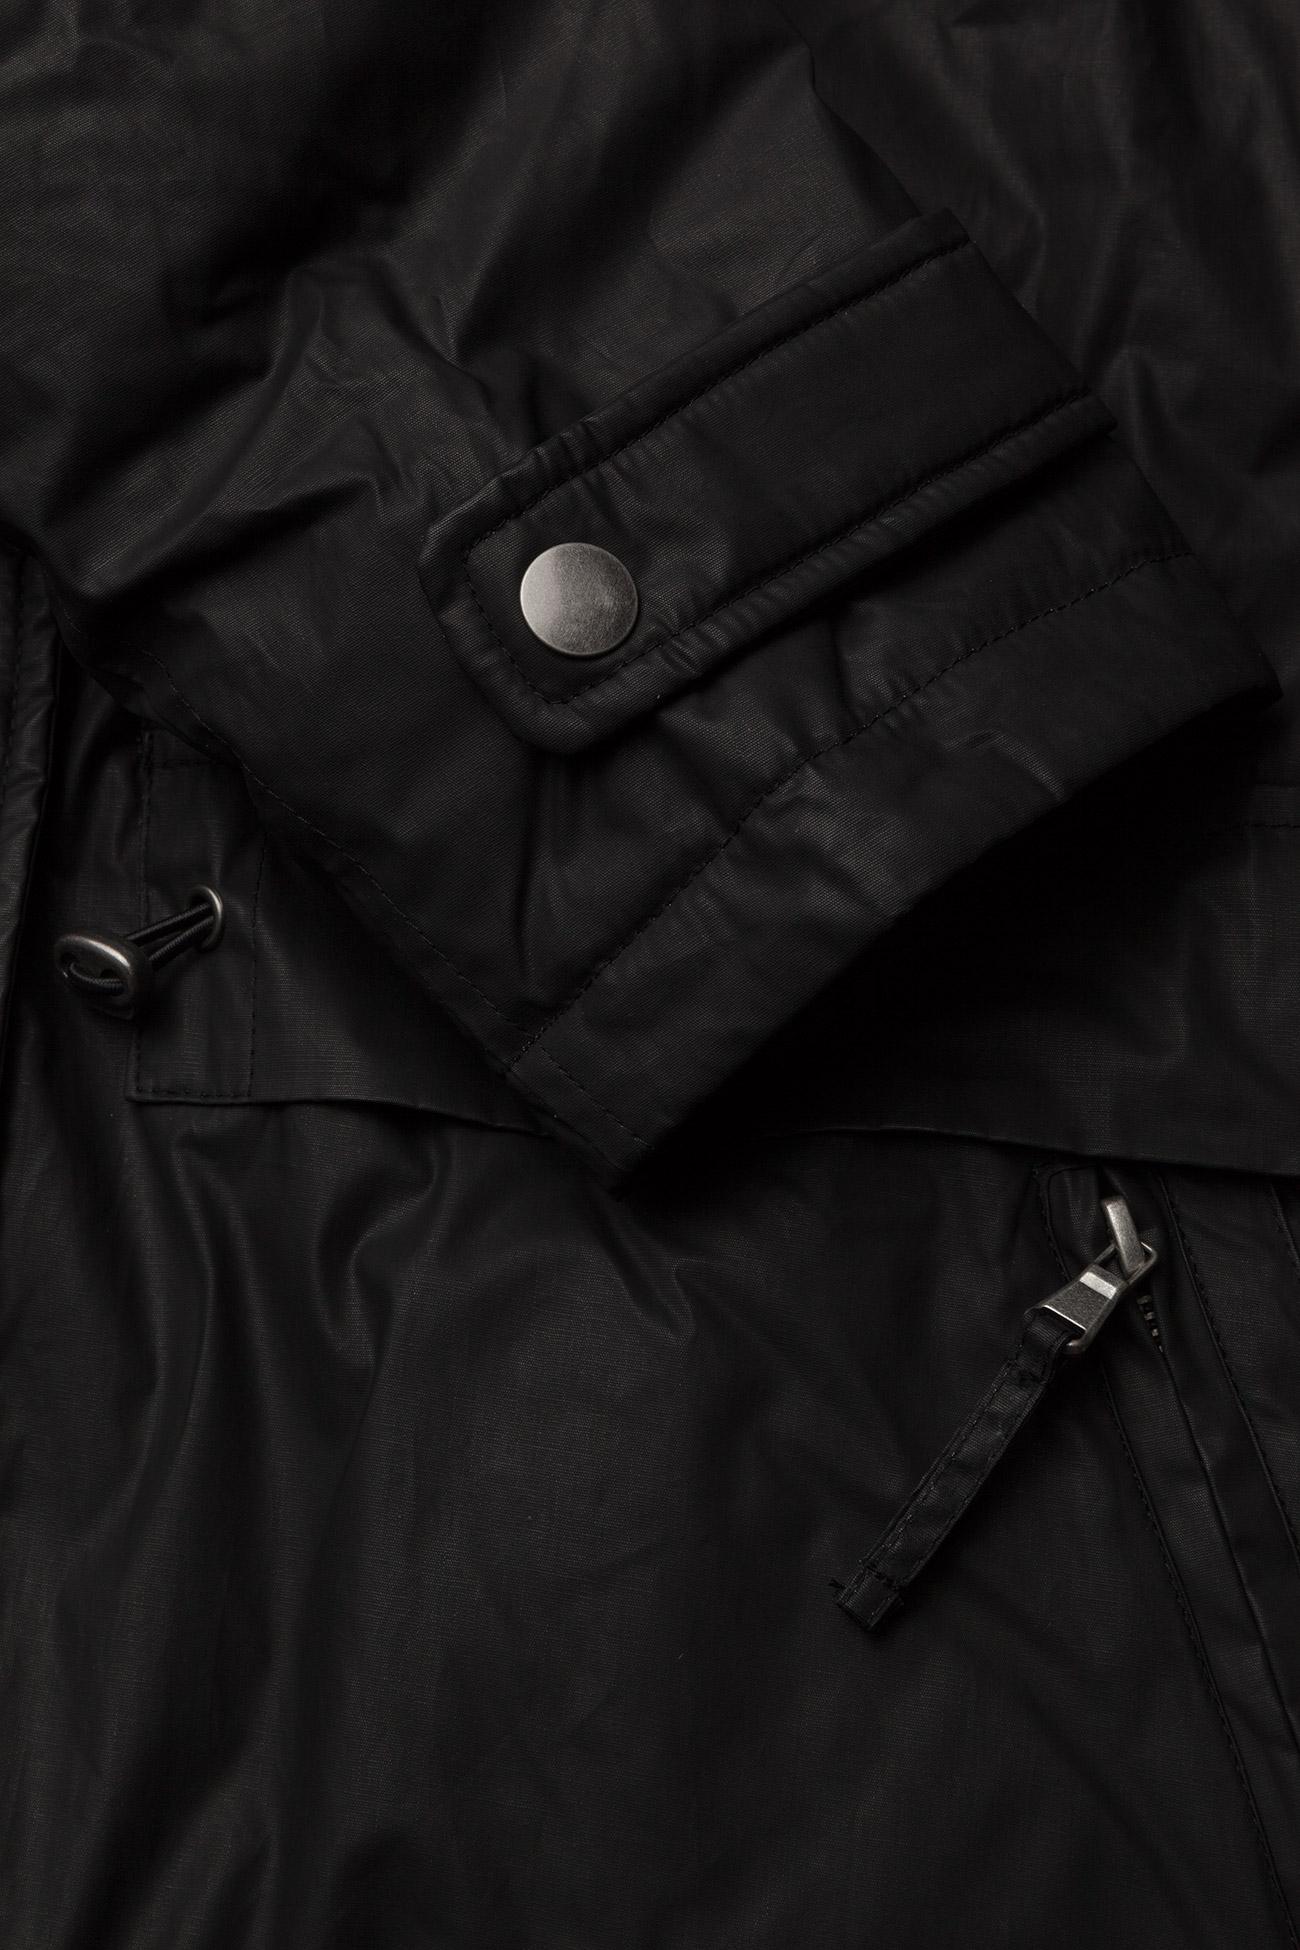 HeavyblackImitz Coat Coat Outerwear Outerwear Coat HeavyblackImitz v8mN0wn